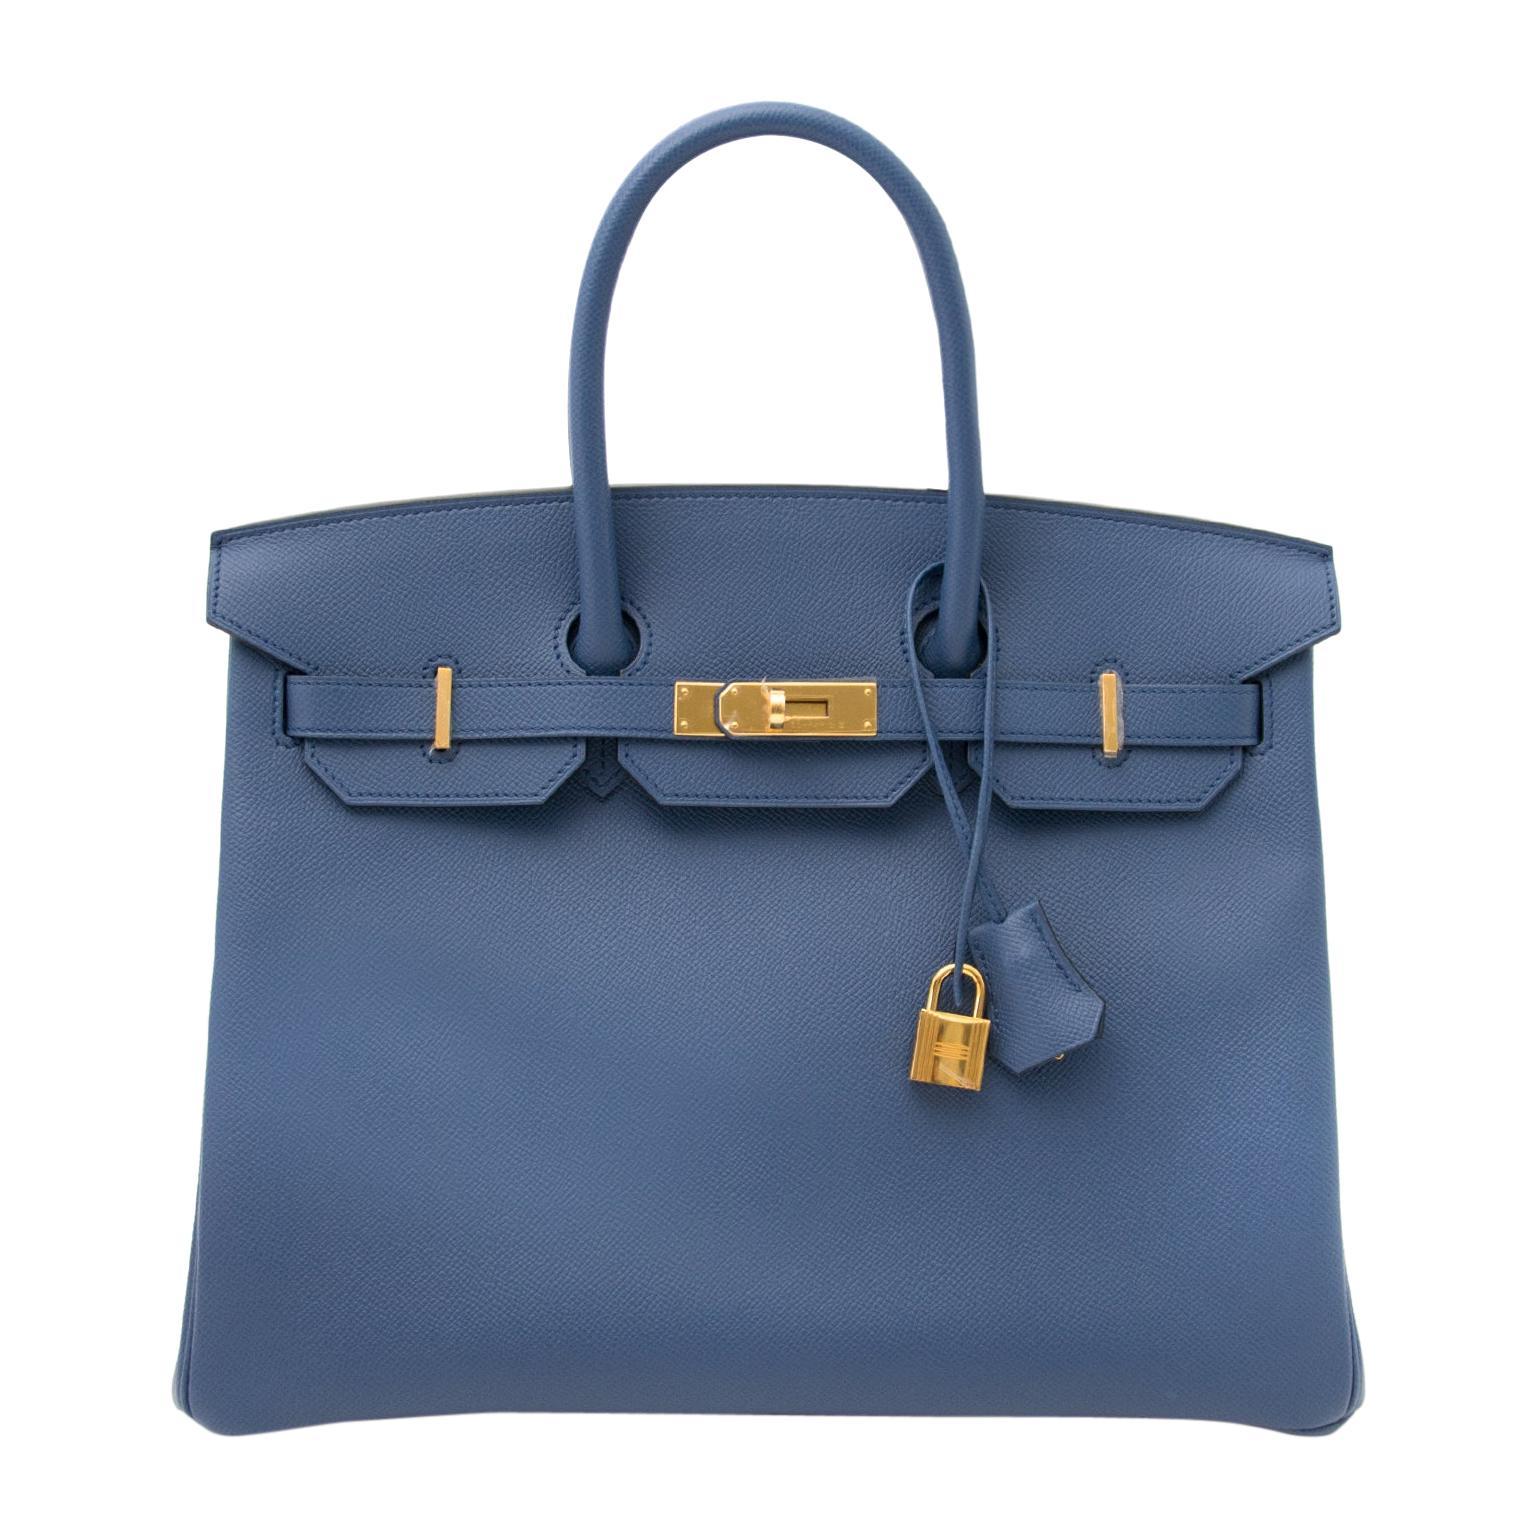 Hermes Birkin 35cm bleu agathe GHW